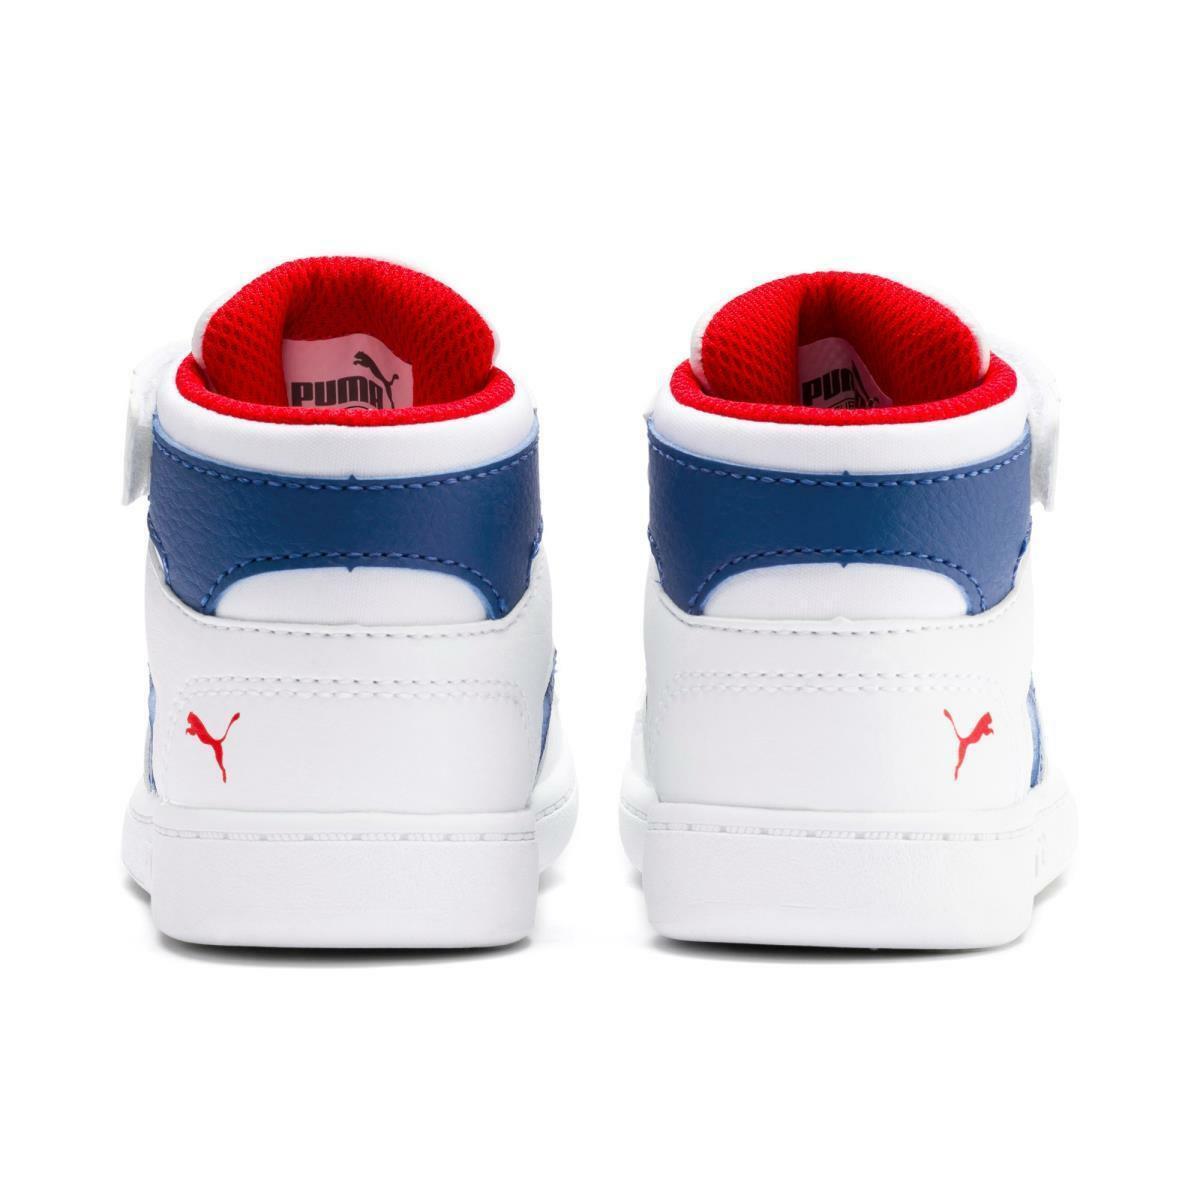 puma puma rebaund layup sl v inf bambino sneaker alta 370489 005 bianco